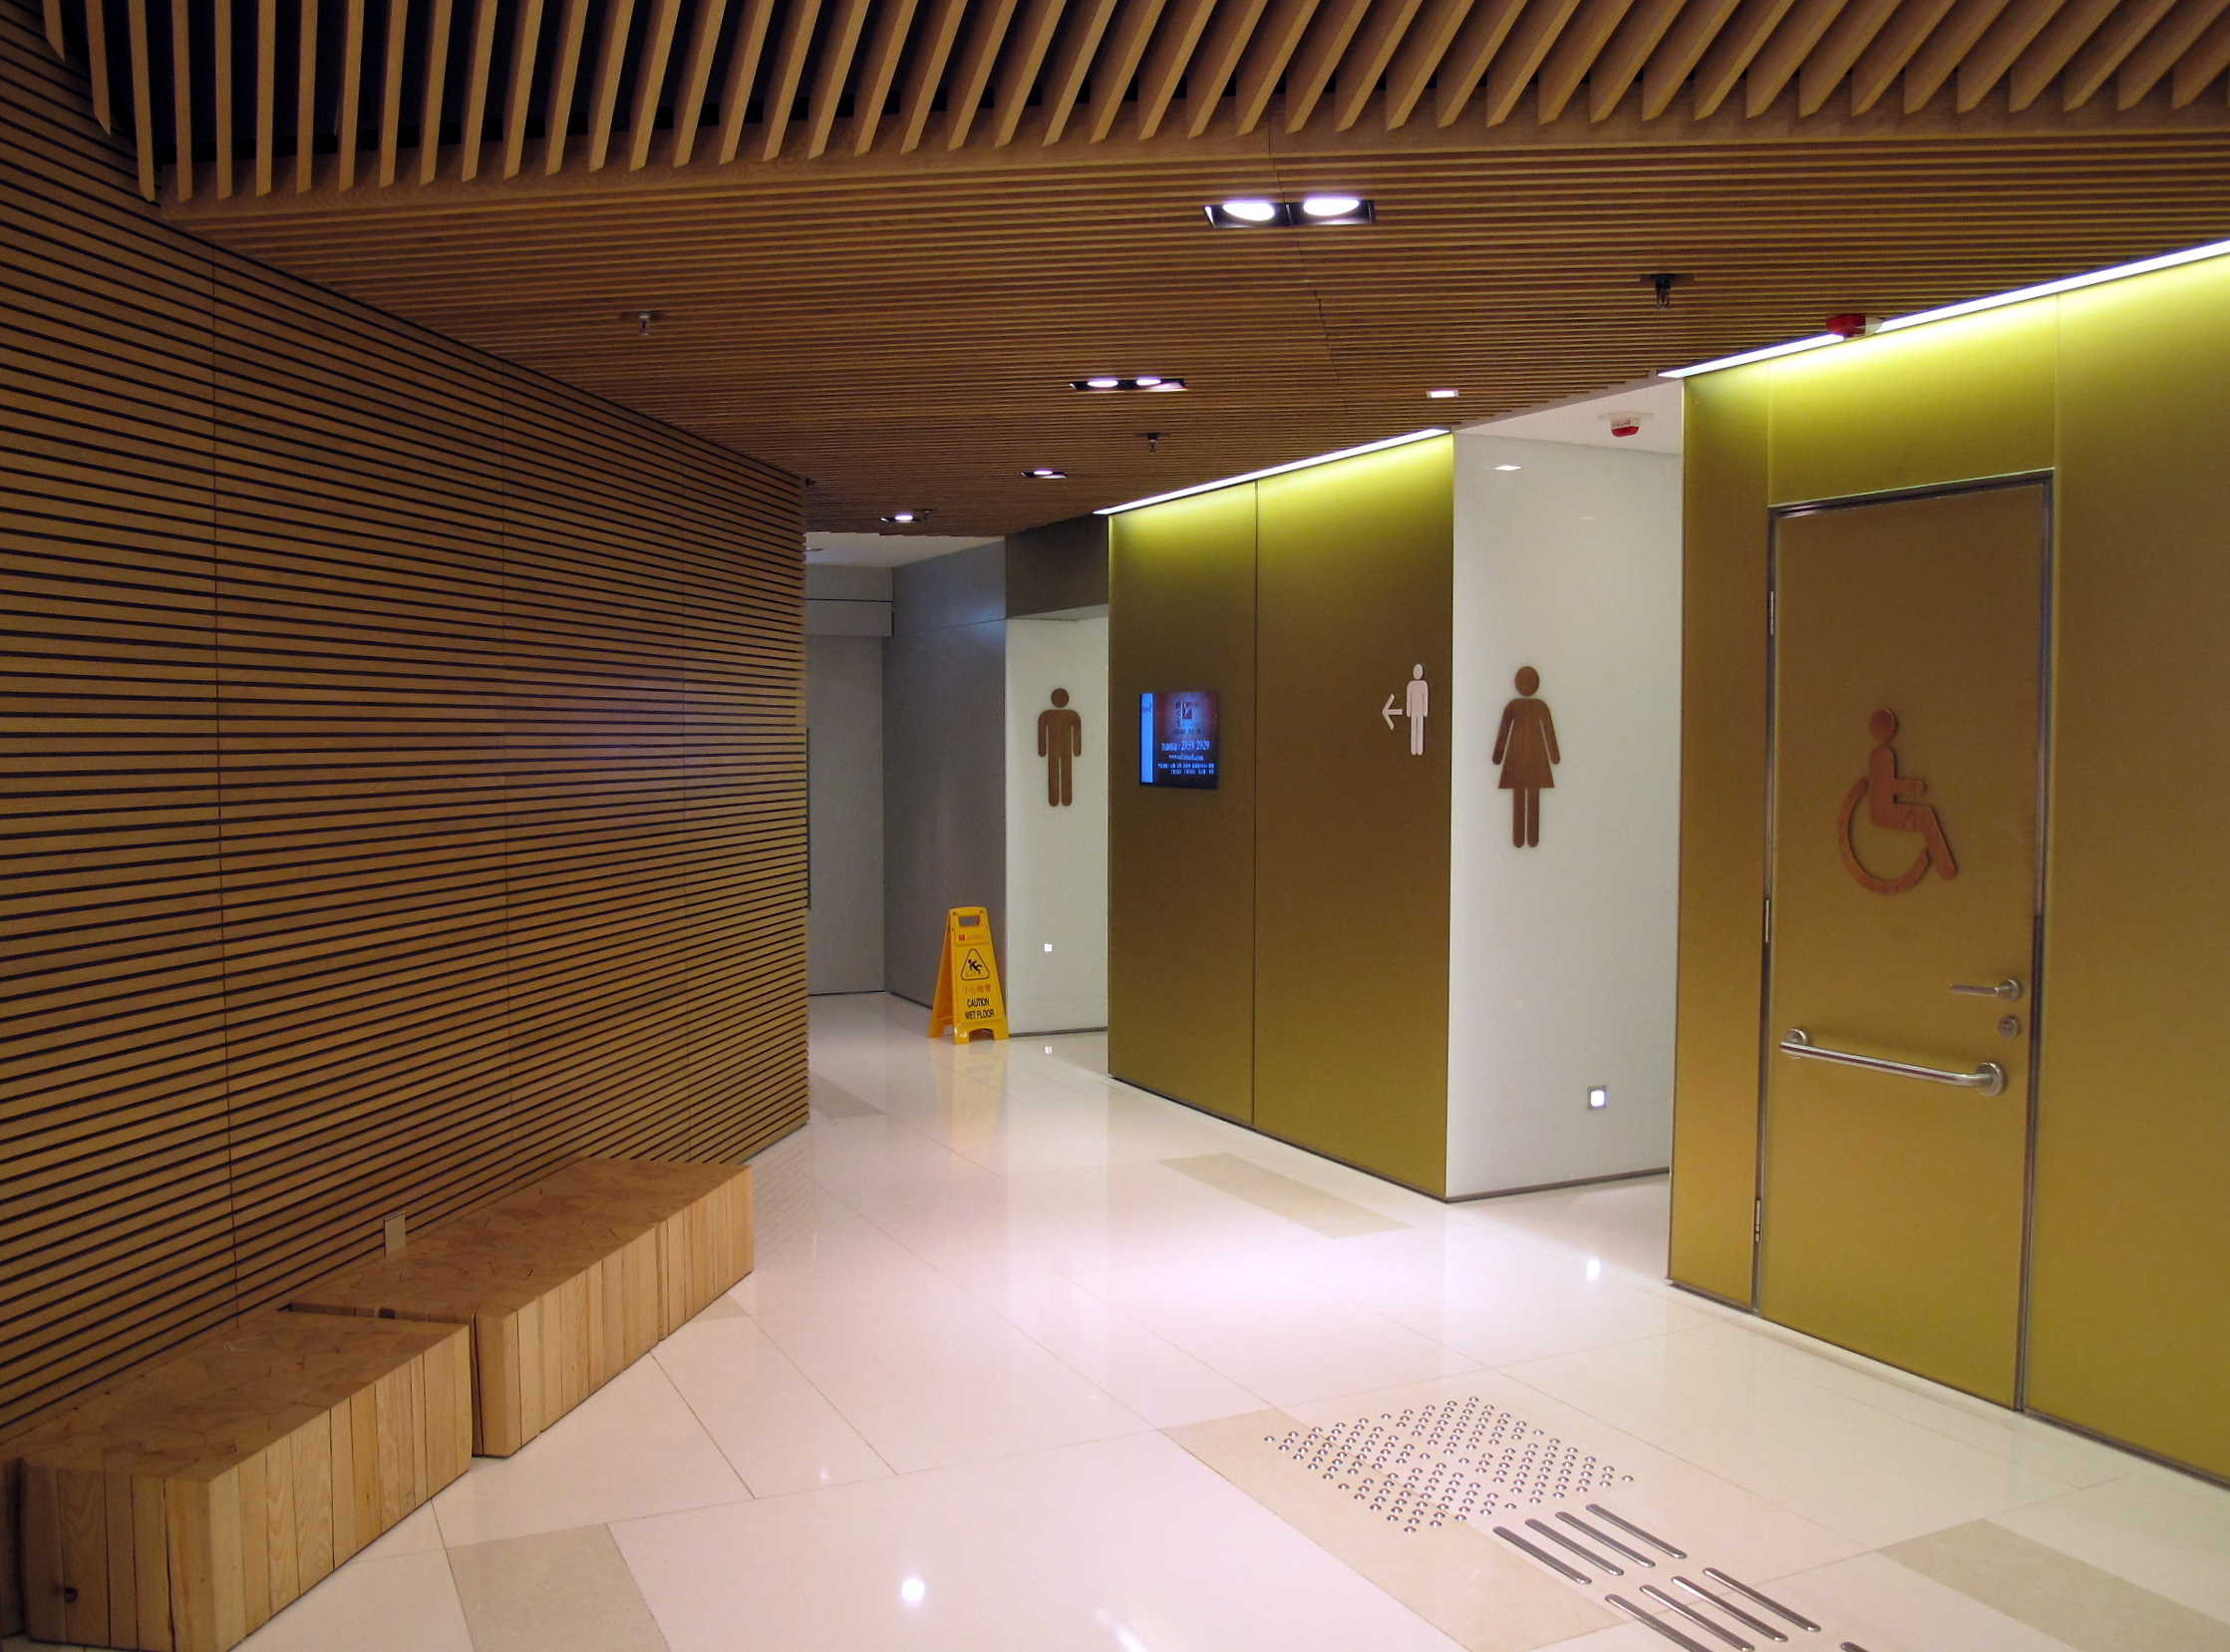 file mikiki restroom enterance wikimedia commons